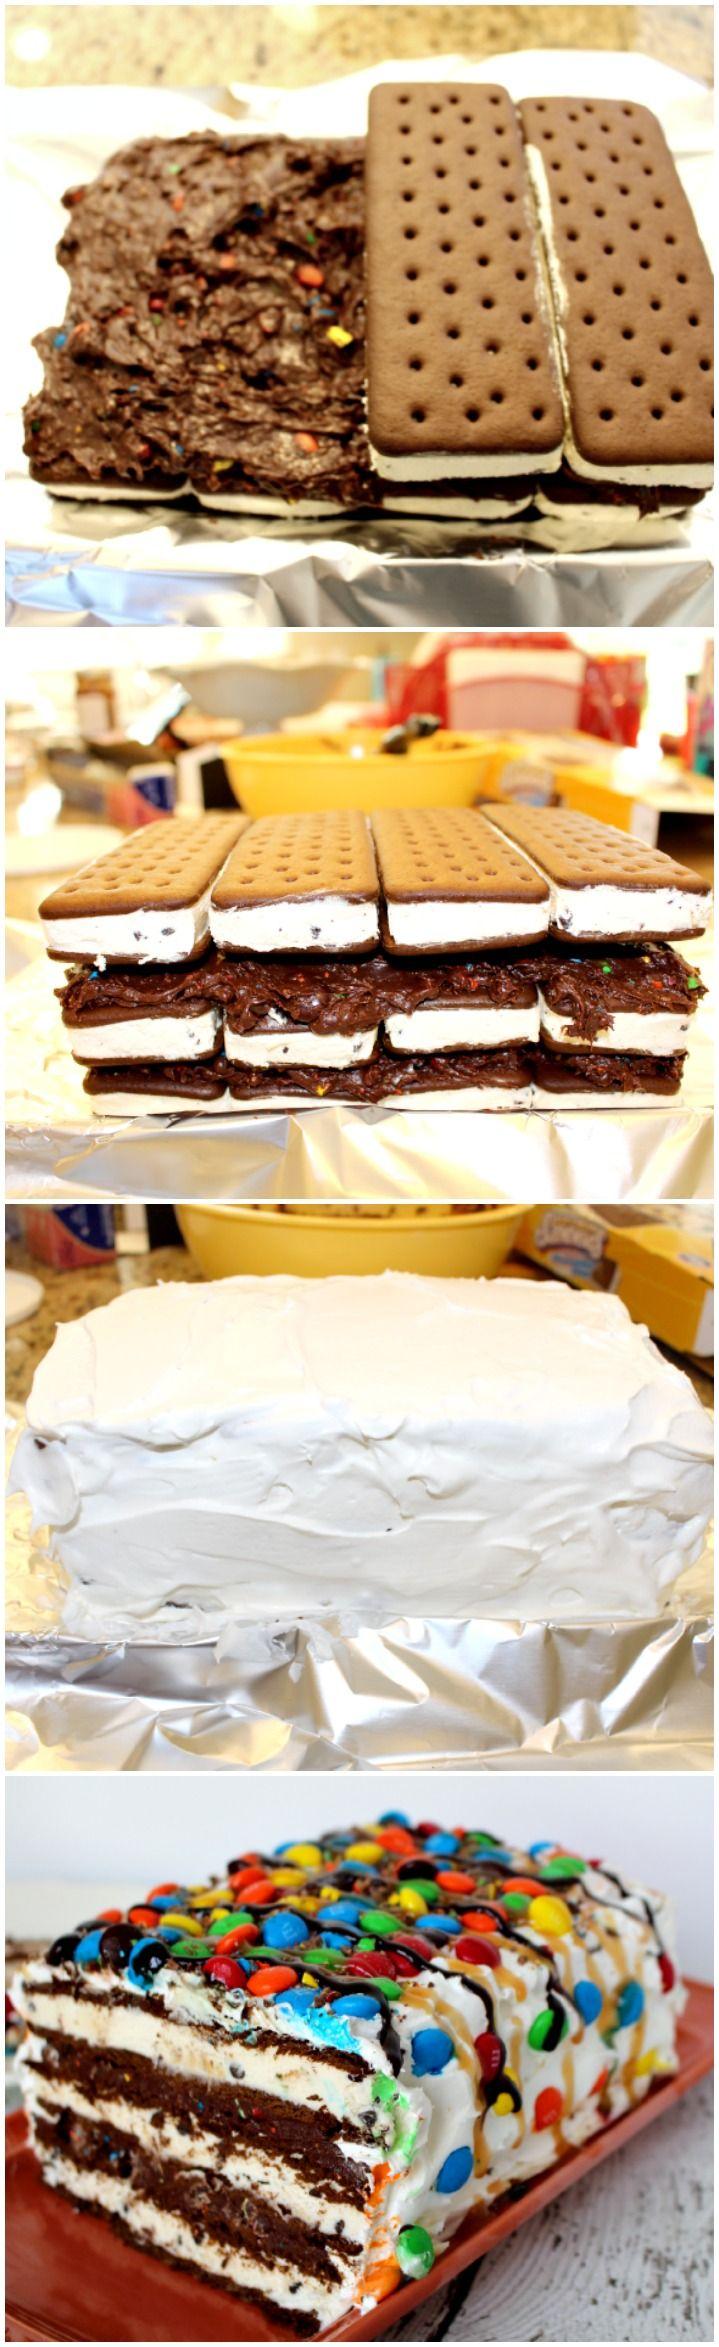 Ice Cream Sandwich Cake - the easiest dessert ever!